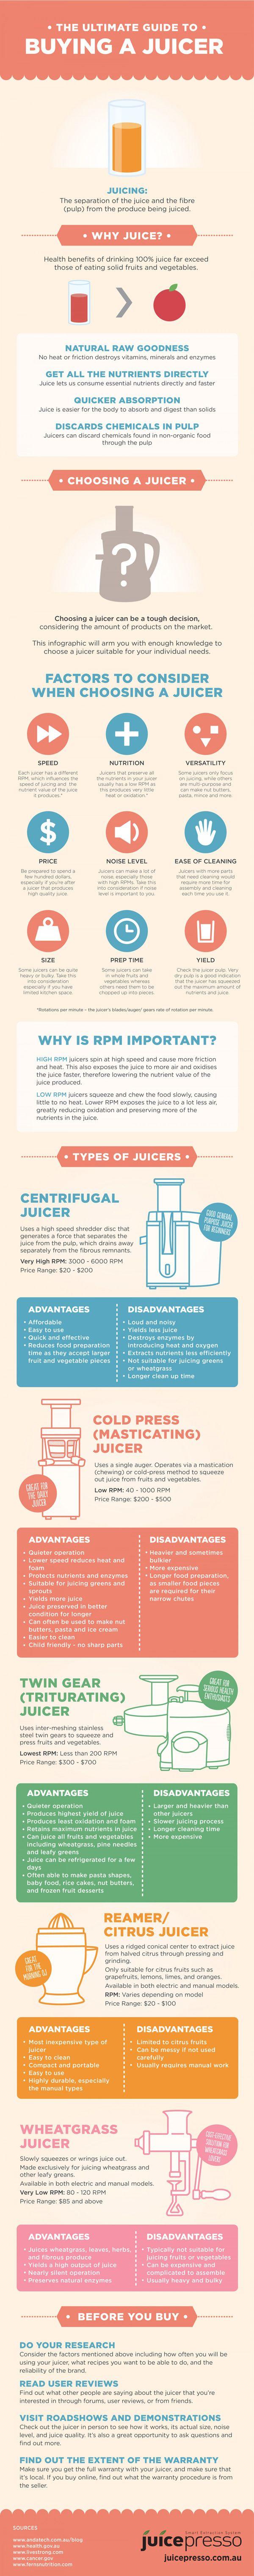 Best Juicers For 2017 - Complete Buying Guide - via @nutr